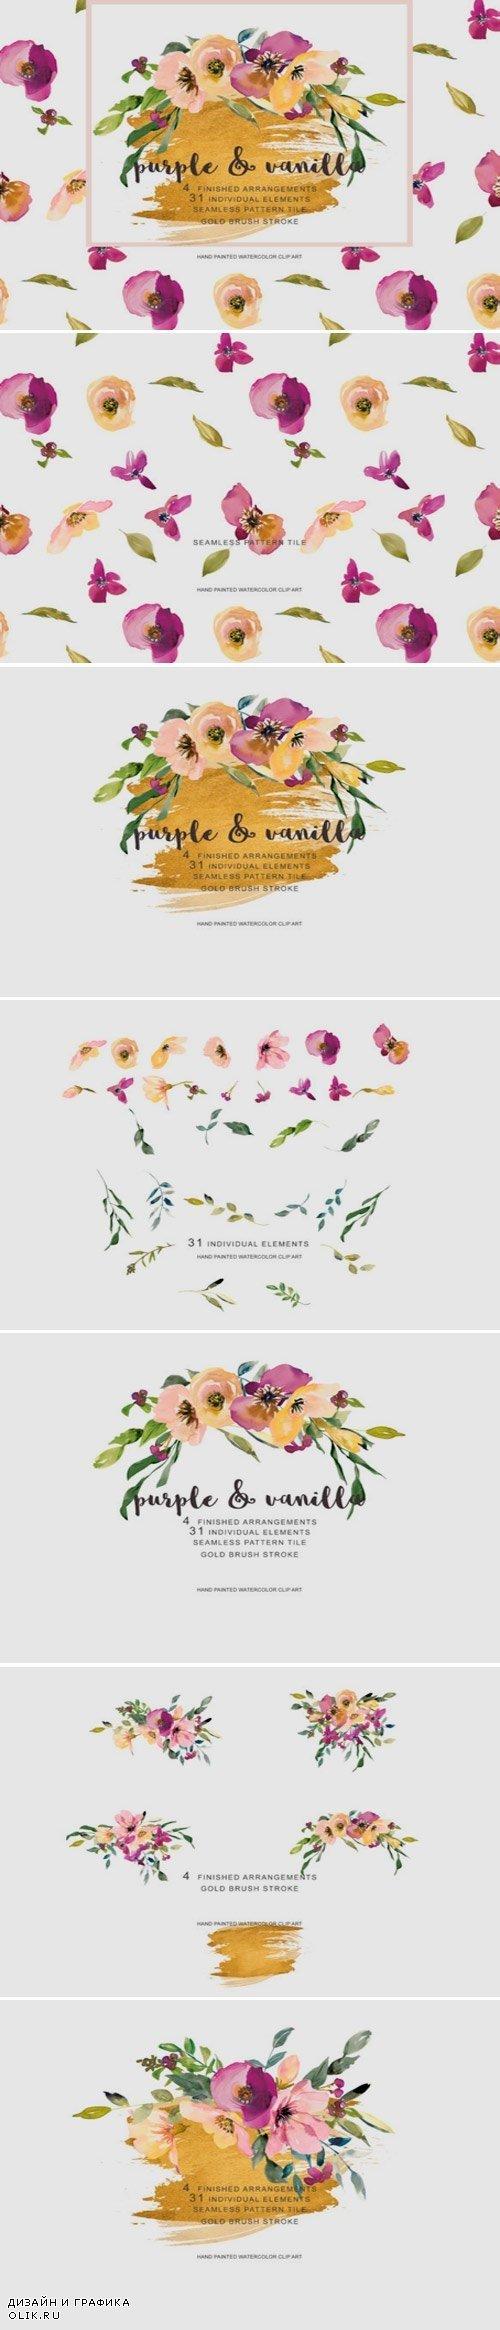 Watercolor Purple and Vanilla Flower - 2889963